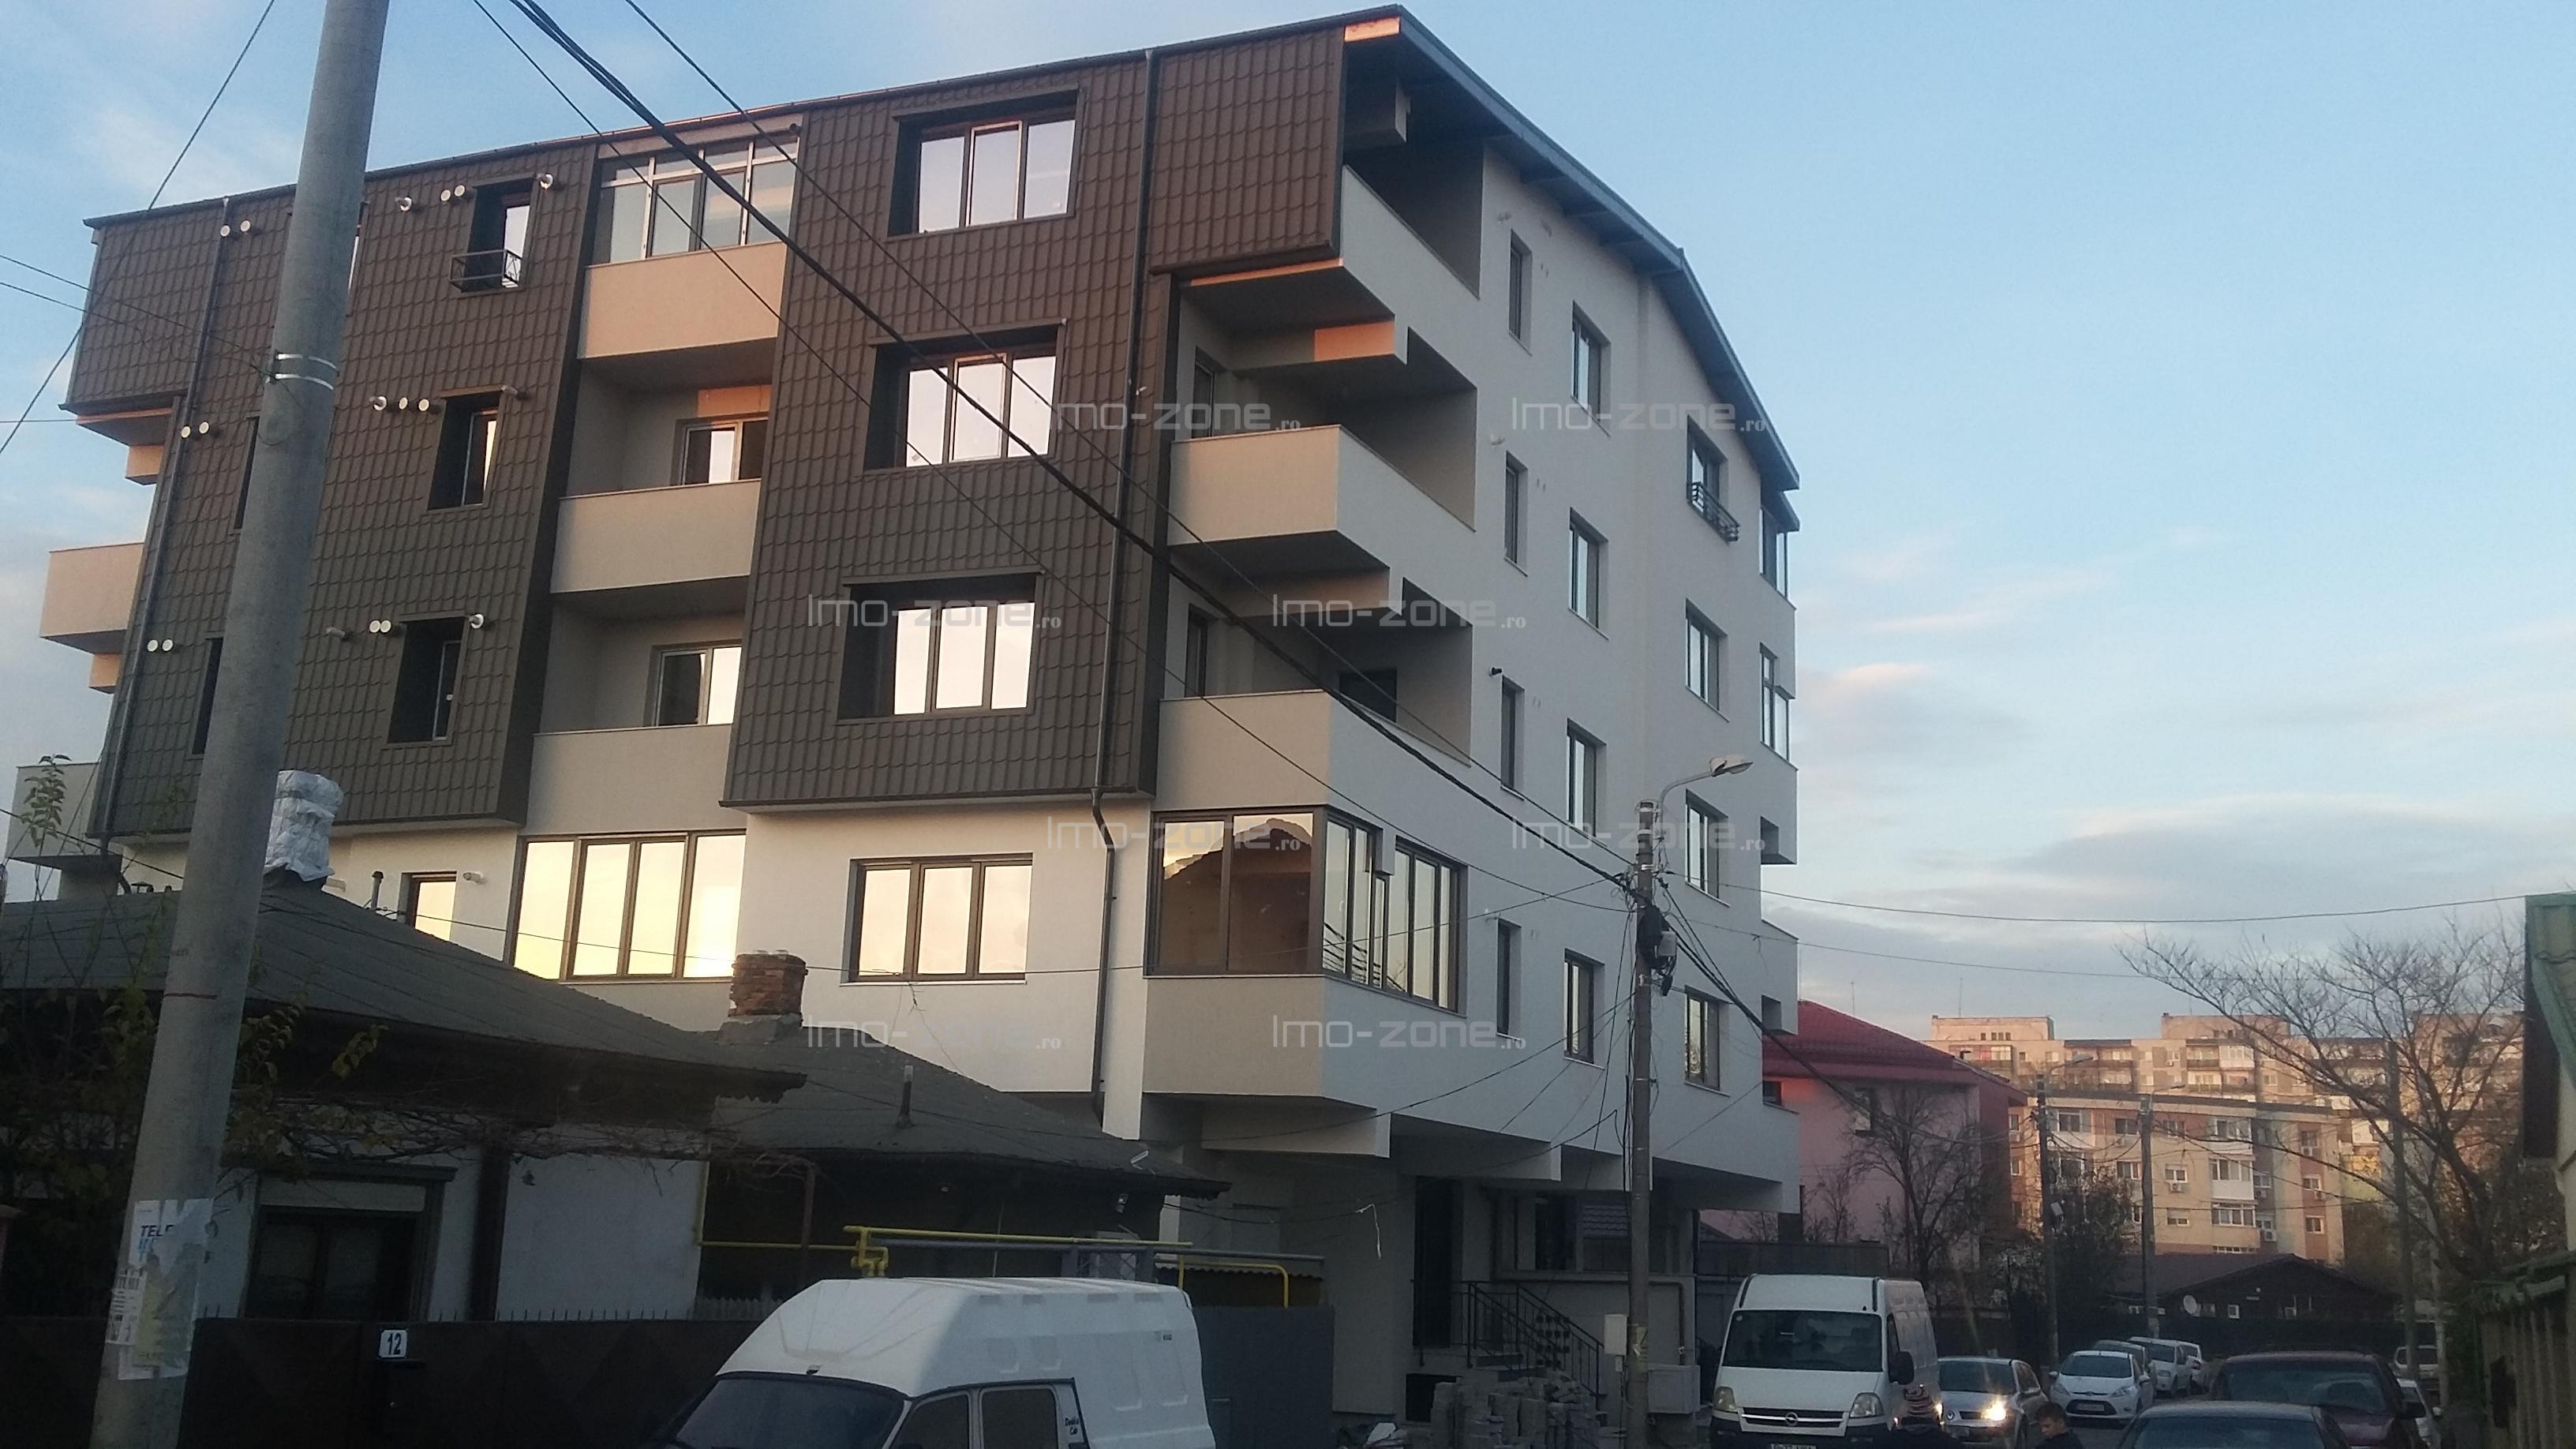 InTown Residence - Acvariului 8